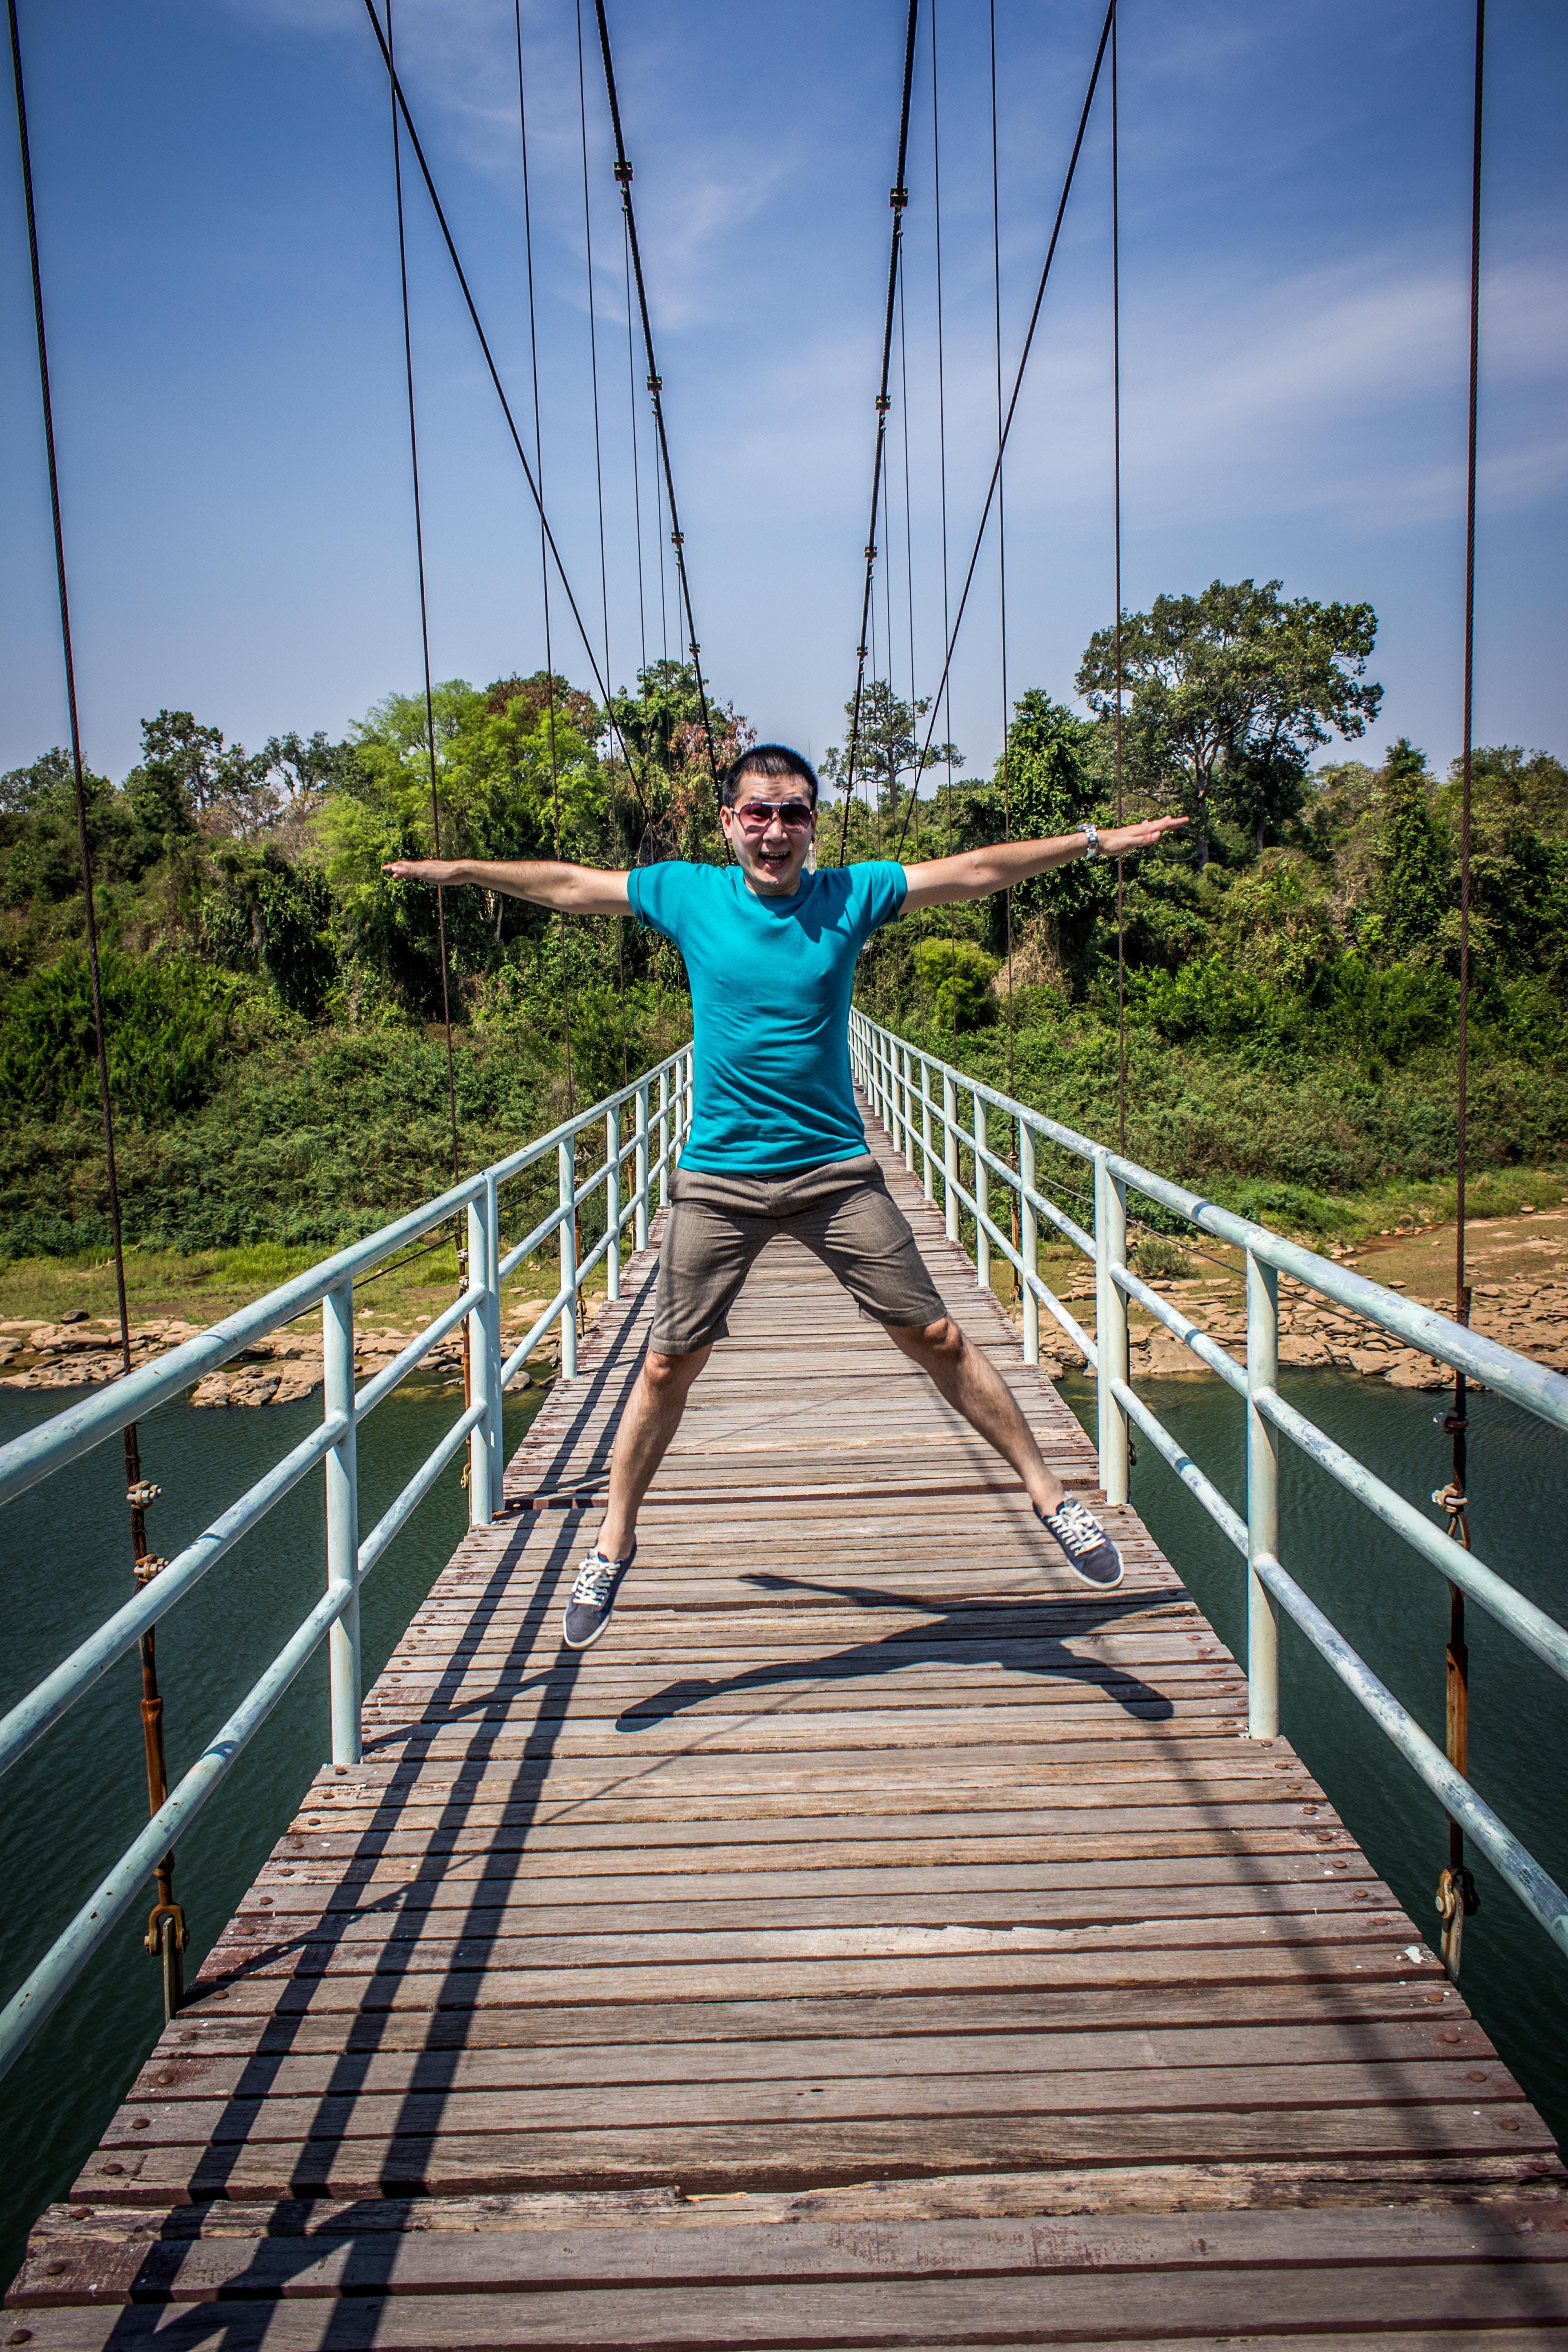 Man Jumping On Bridge